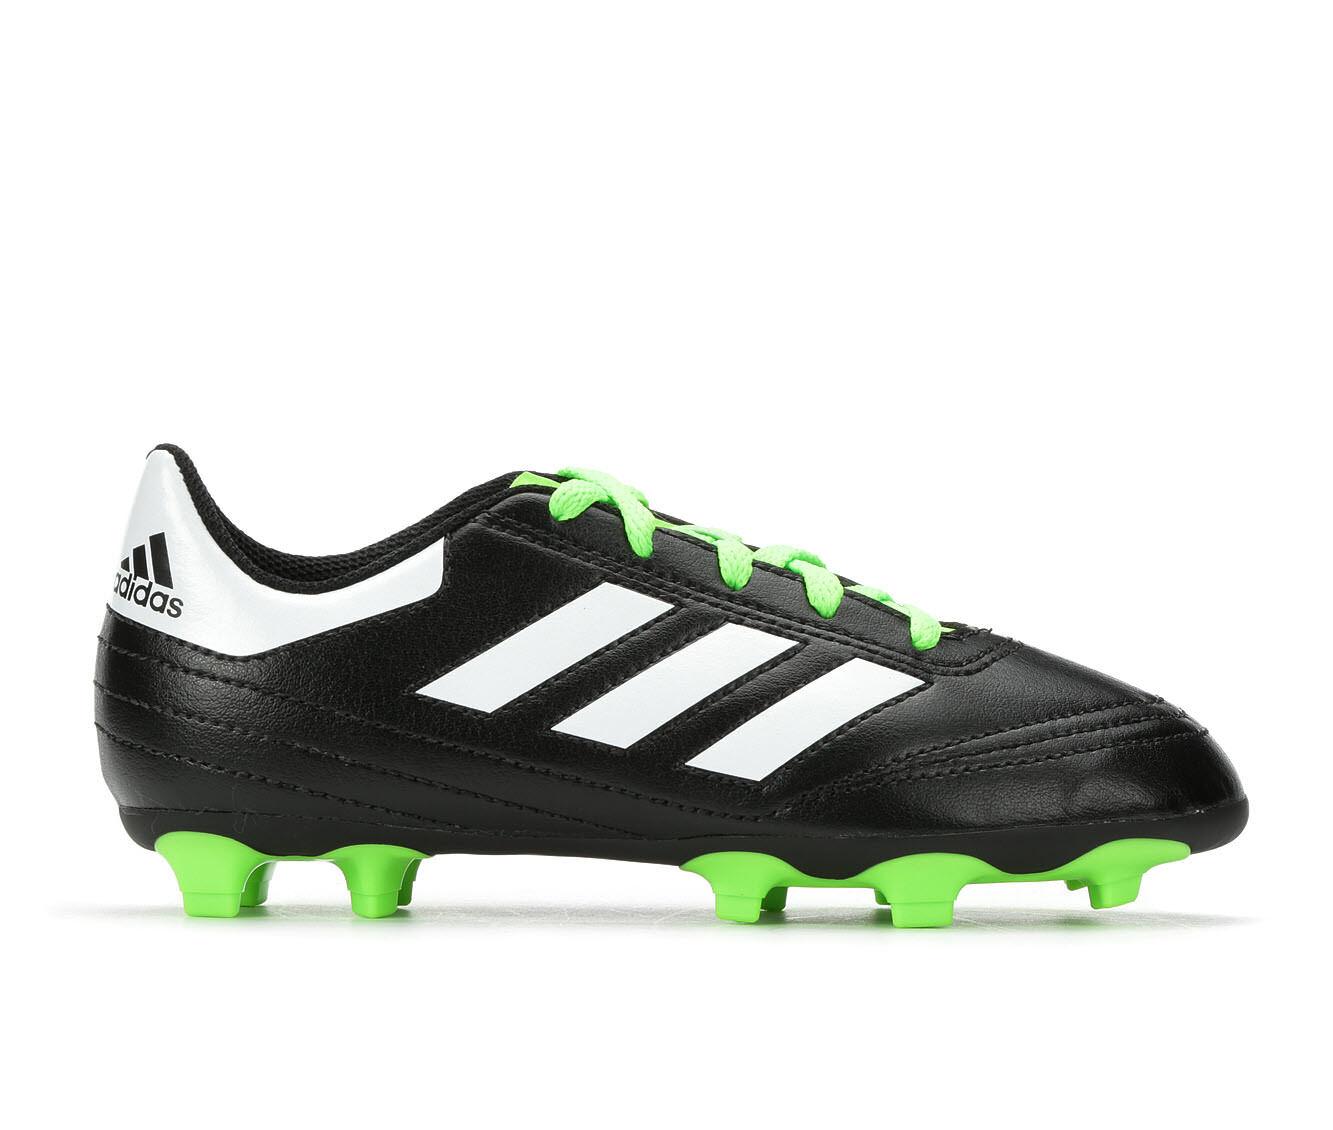 5a1f94ce9189 ... official kids adidas little kid big kid goletto vi fg soccer cleats  shoe f7e83 bdcc4